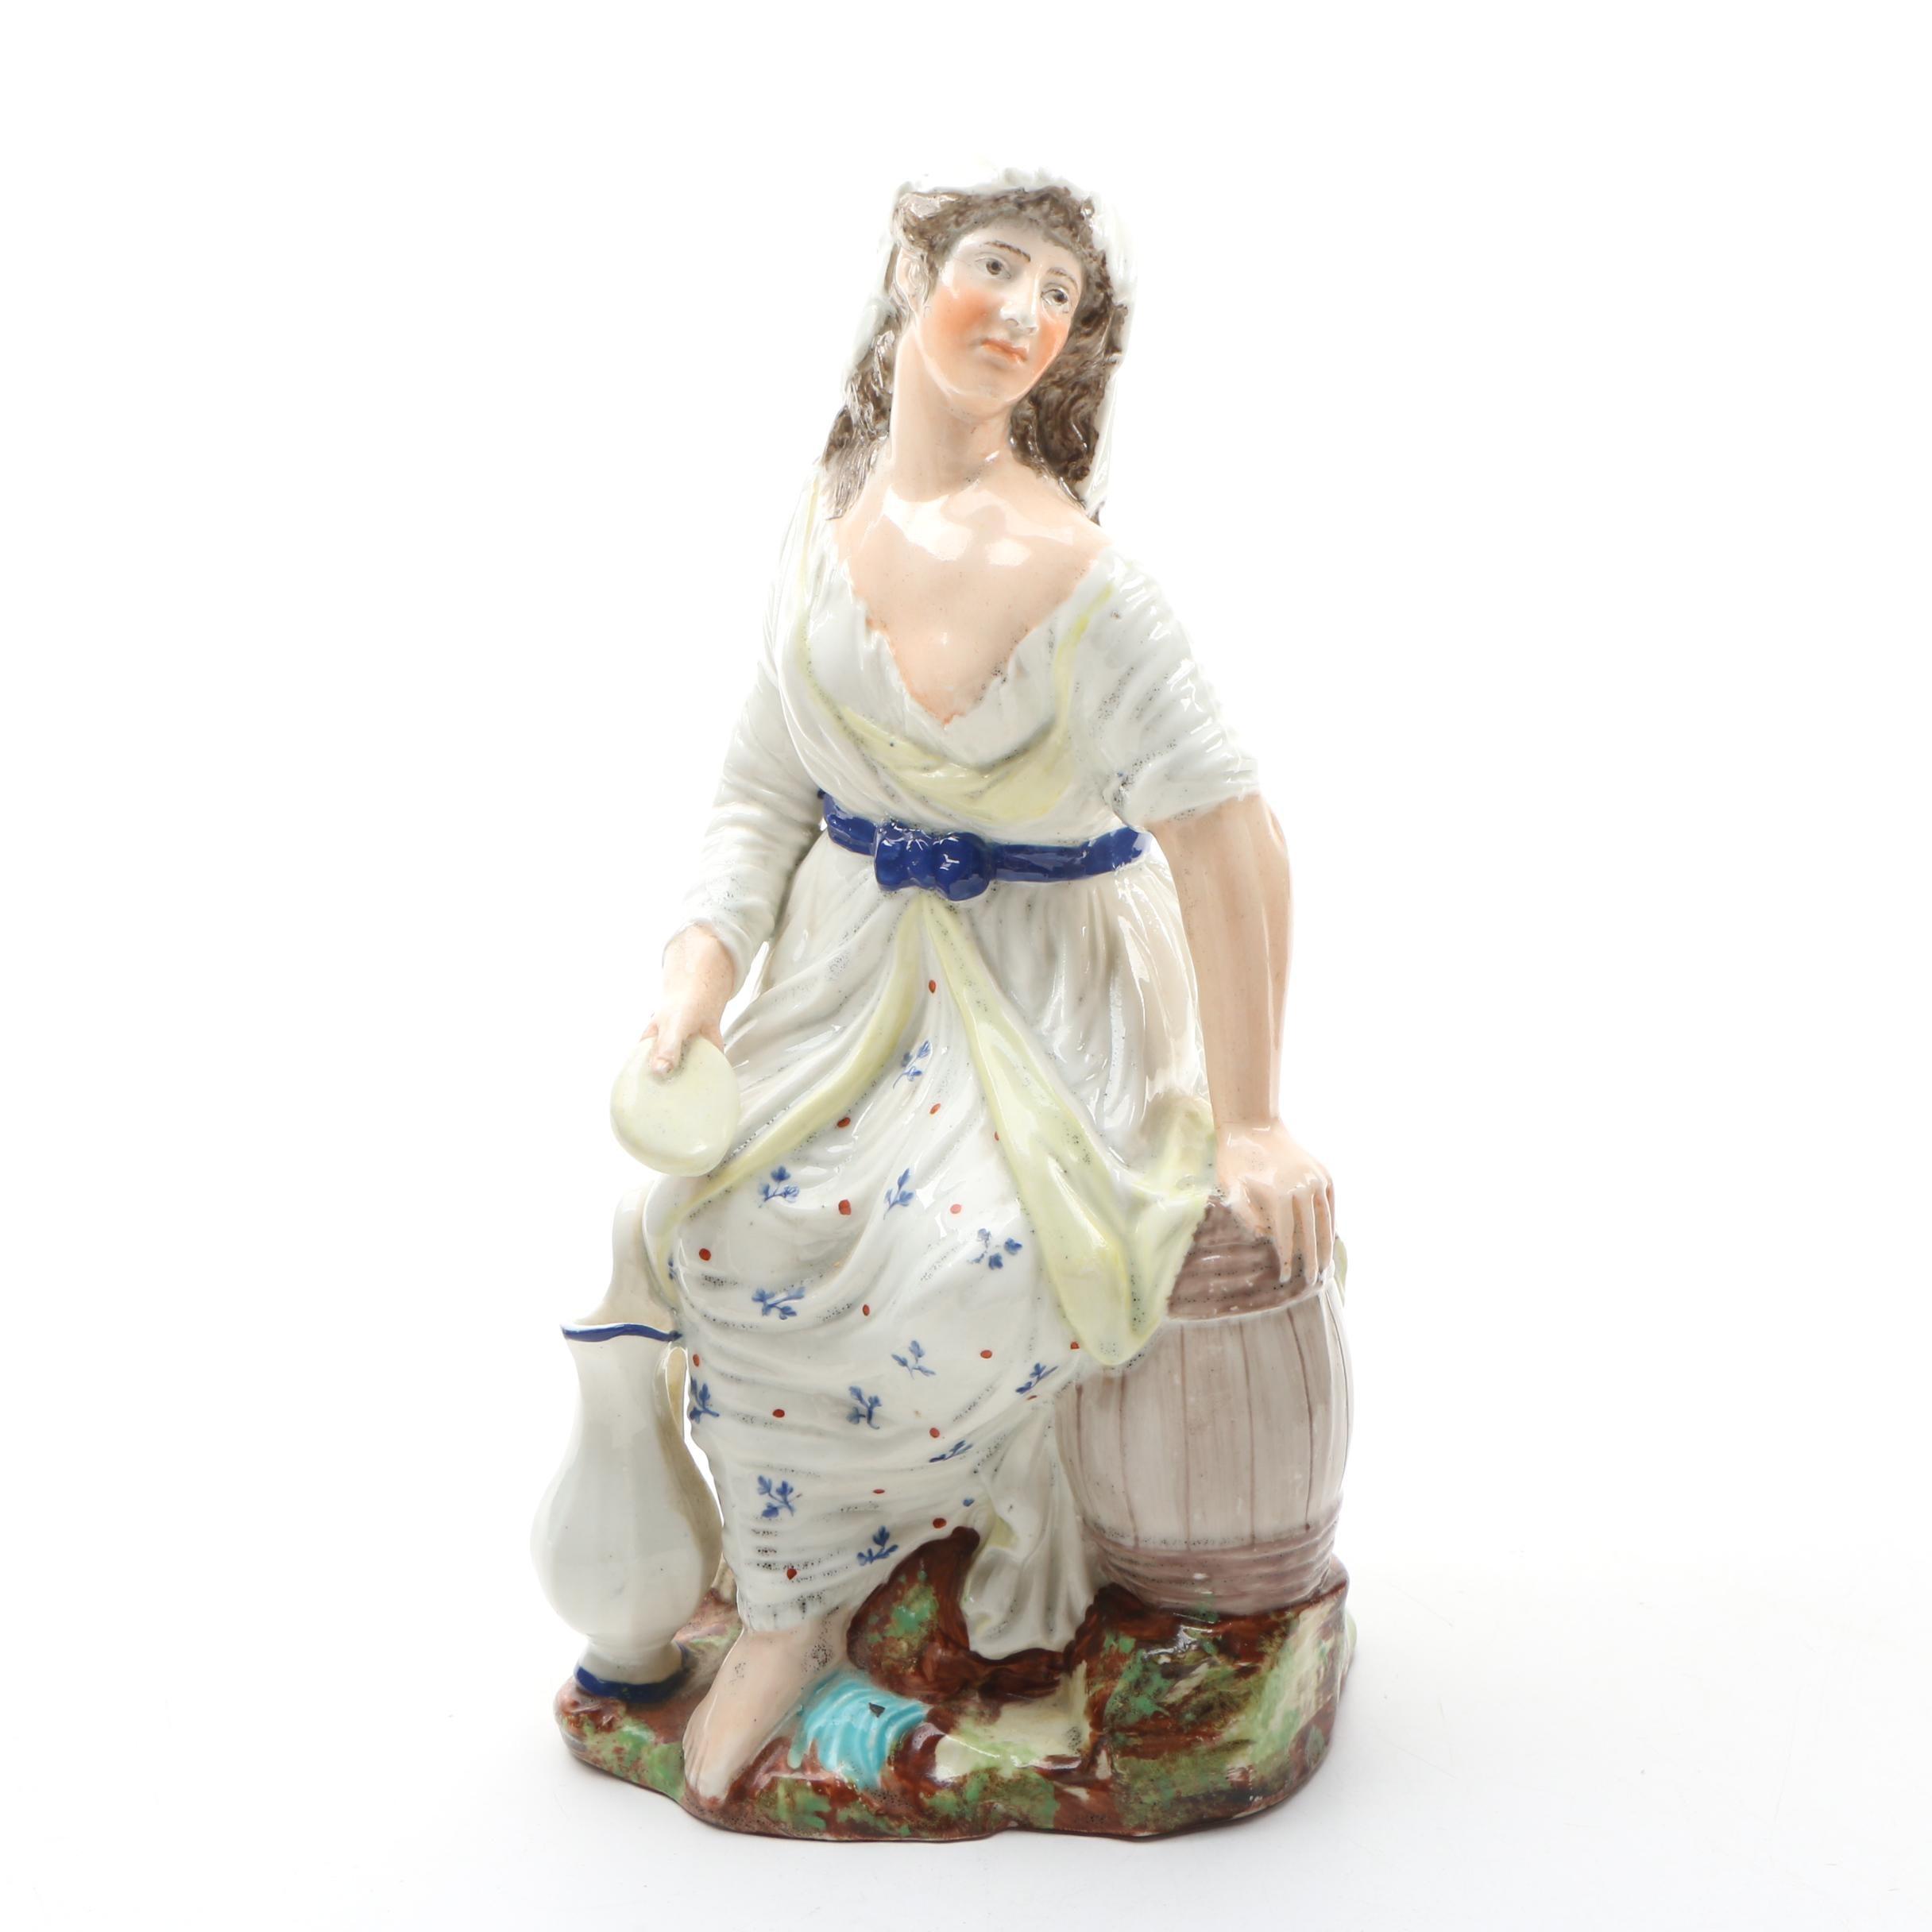 Staffordshire Ceramic Figurine of Woman, Late 20th Century